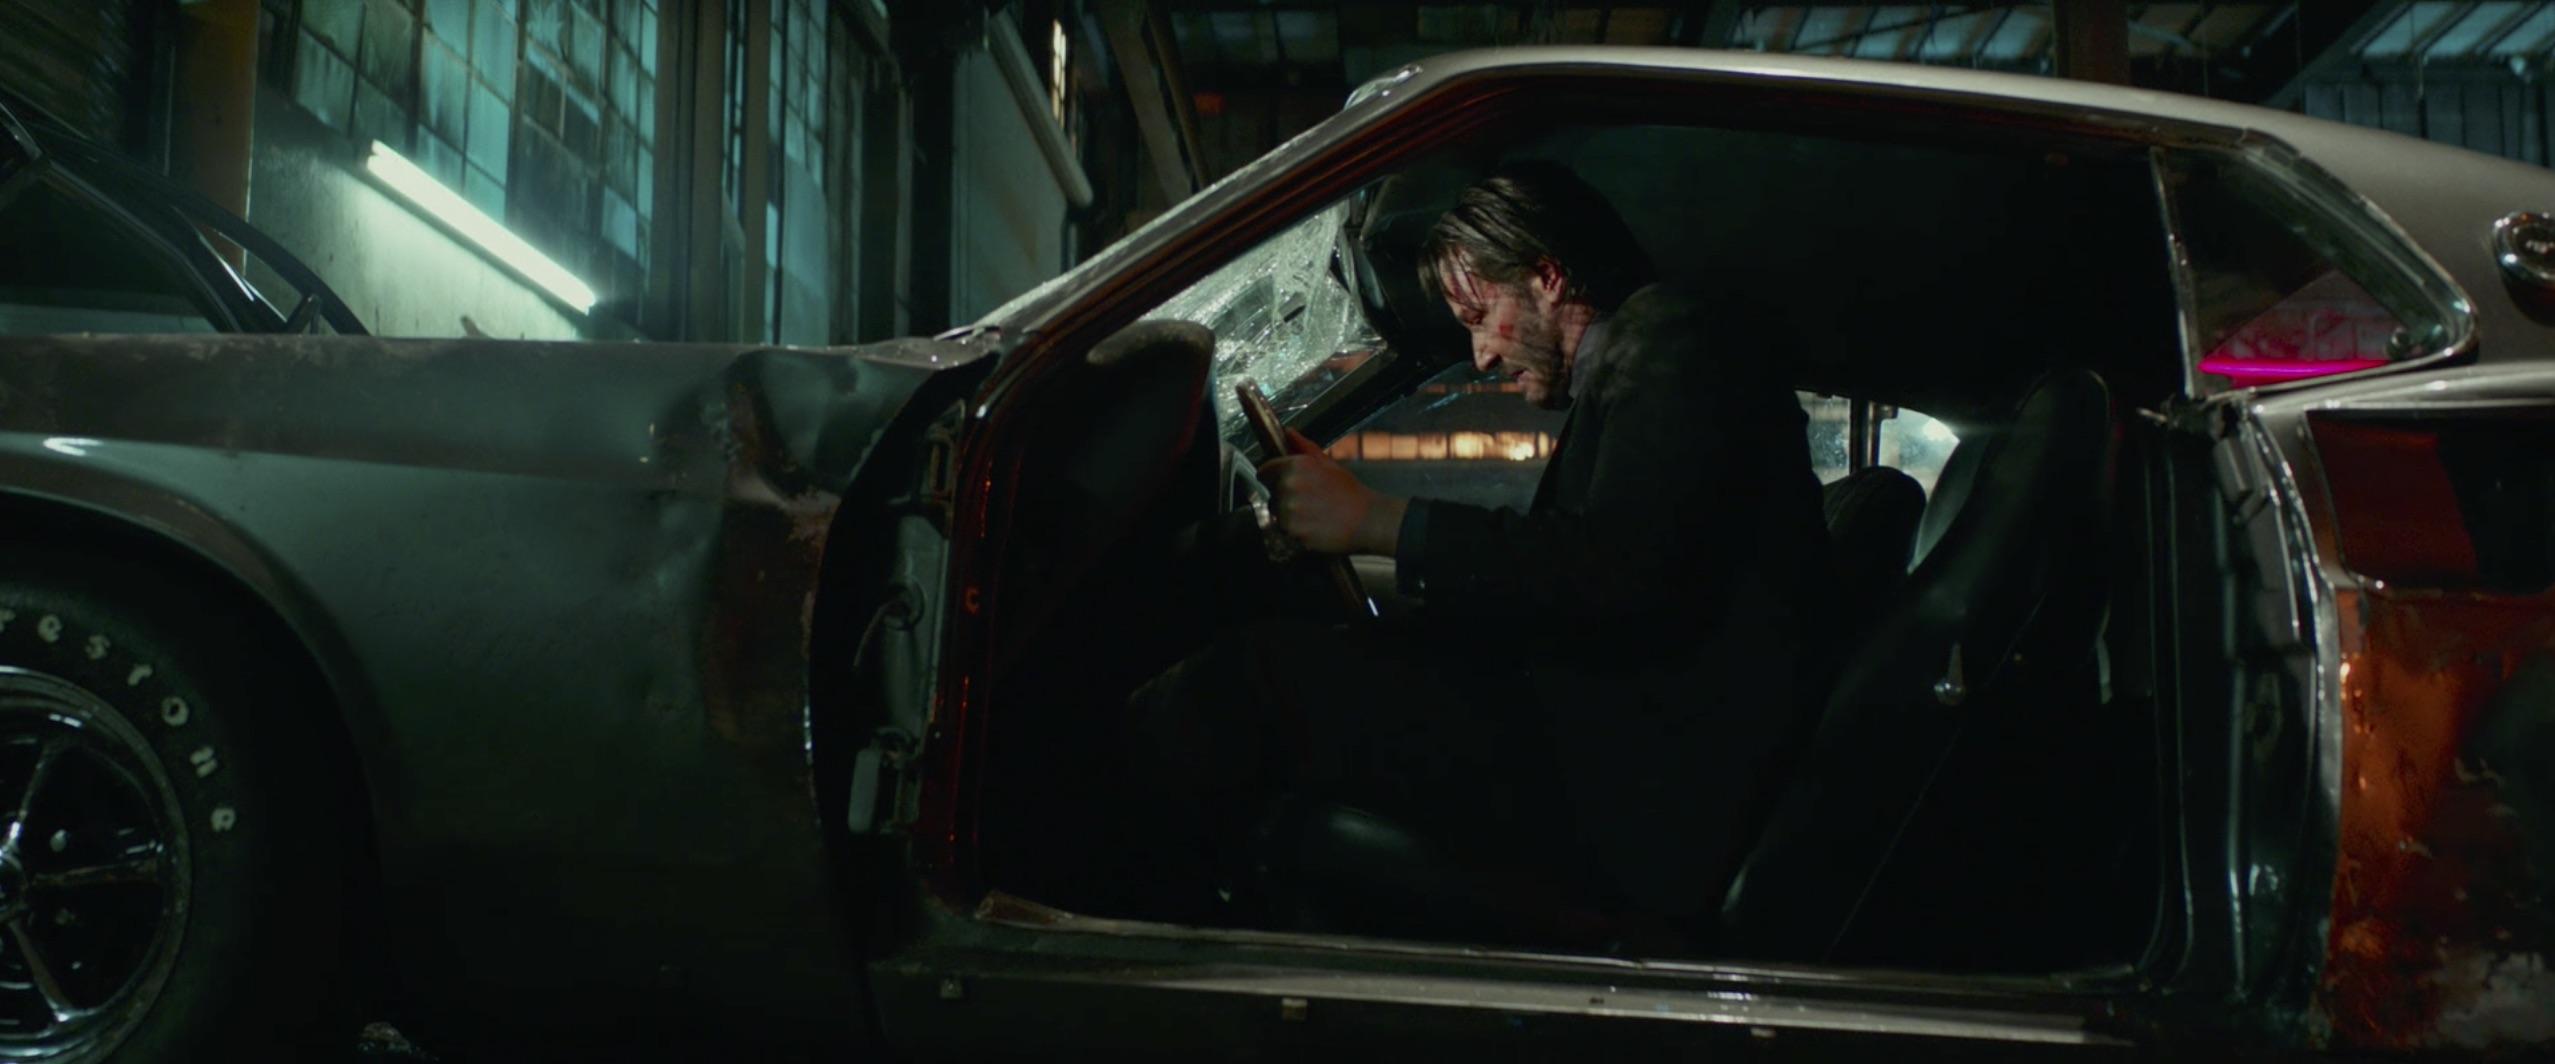 John Wick: Chapter 2 Keanu Reeves driving